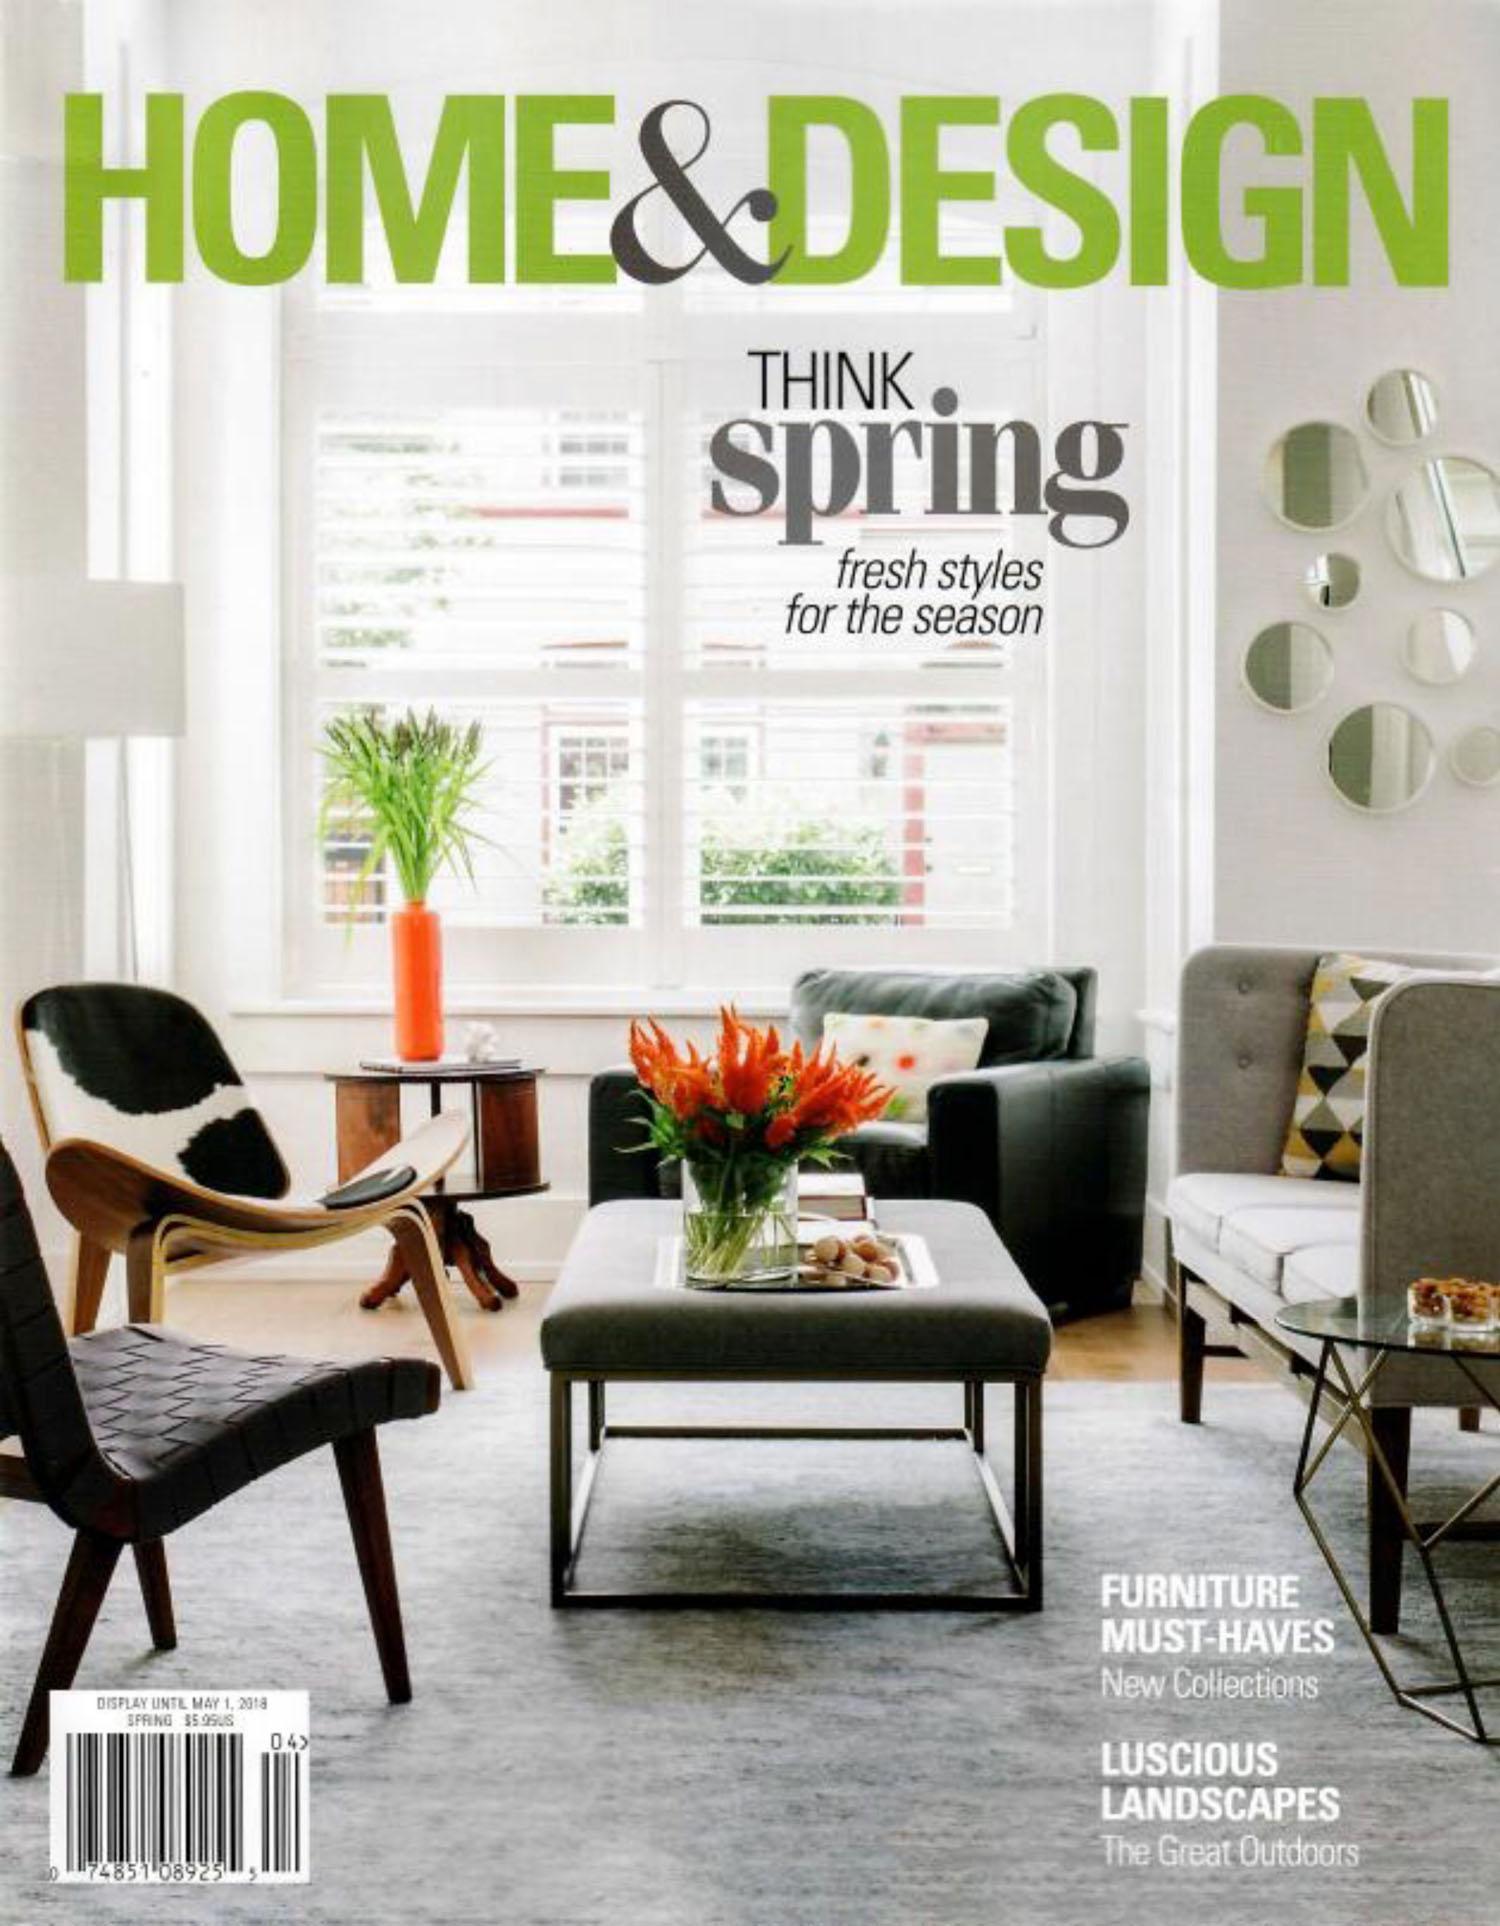 Home & Design March/April 2018